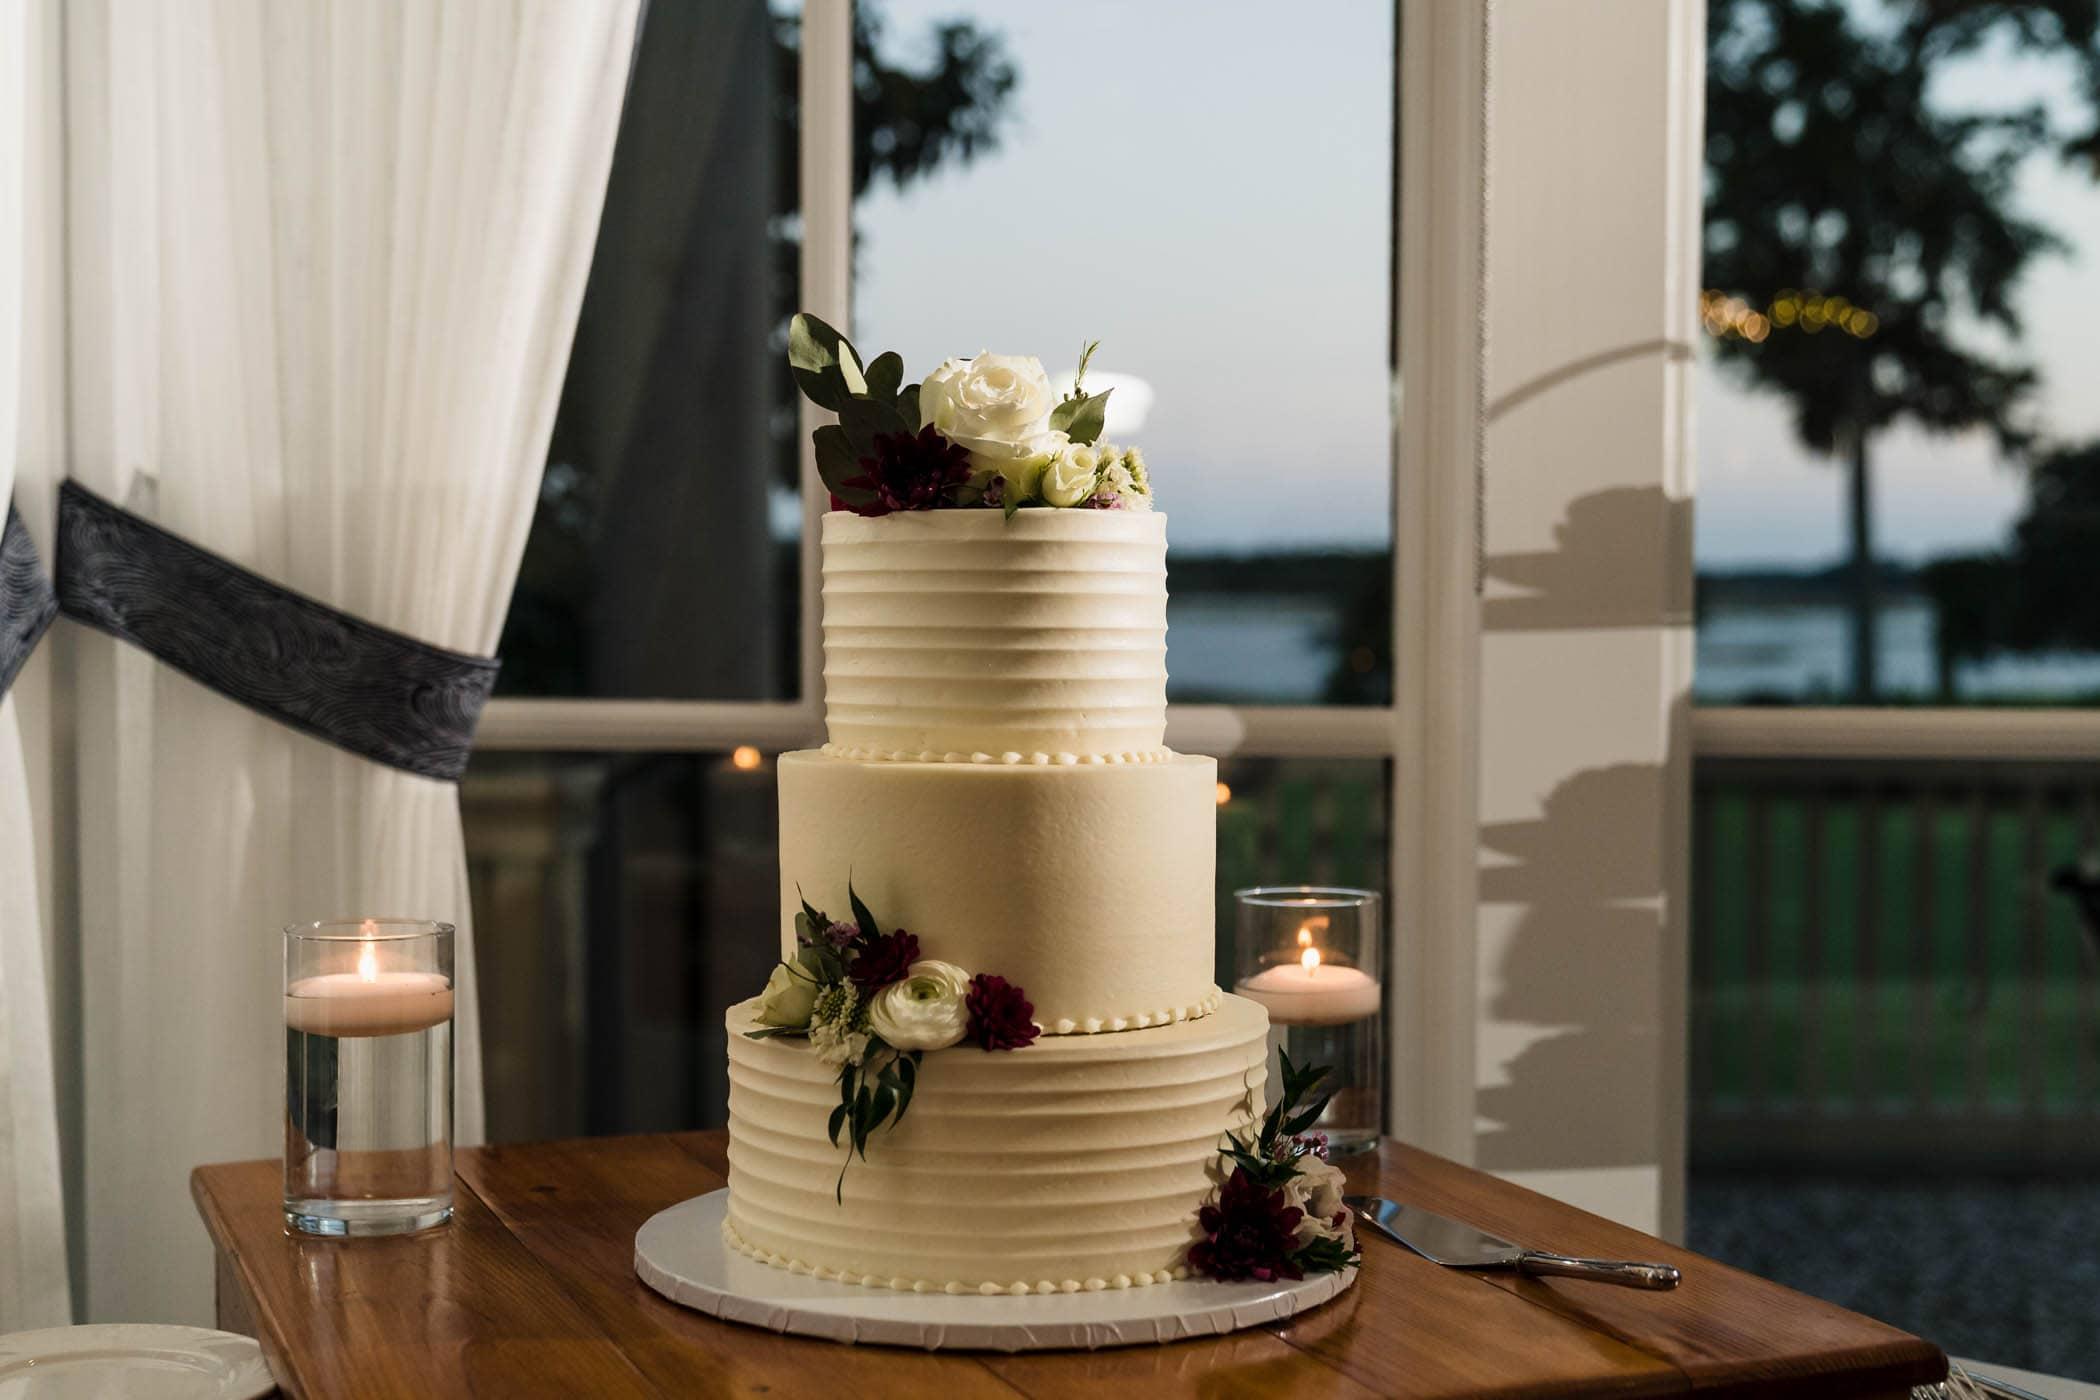 Wedding Cake by Bloom Custom Cakes Dataw Island Club House by Susan DeLoach Photography SC wedding photographers